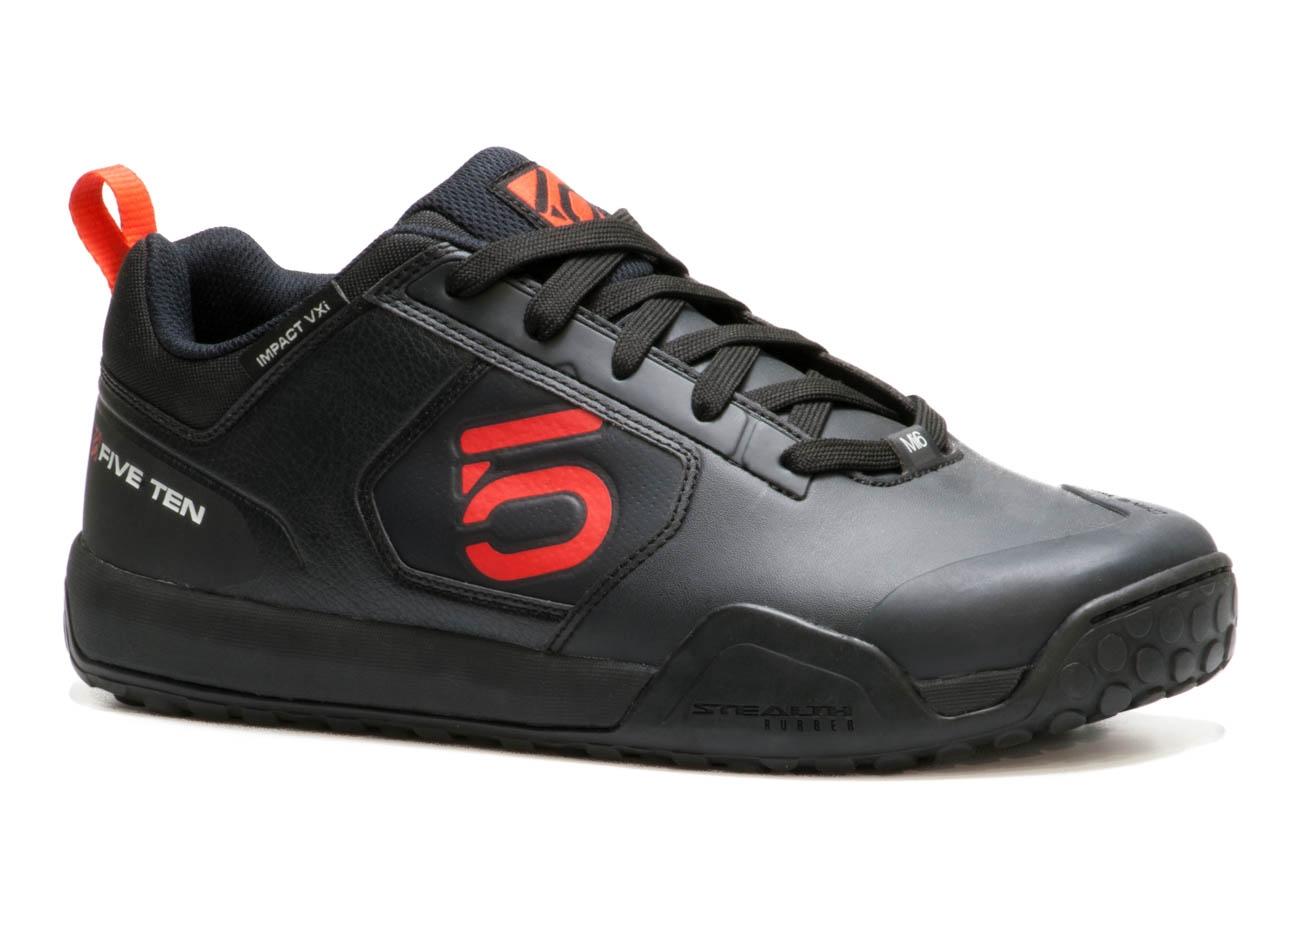 Chaussures Five Ten IMPACT VXI Noir - UK-9.0 (43.0)